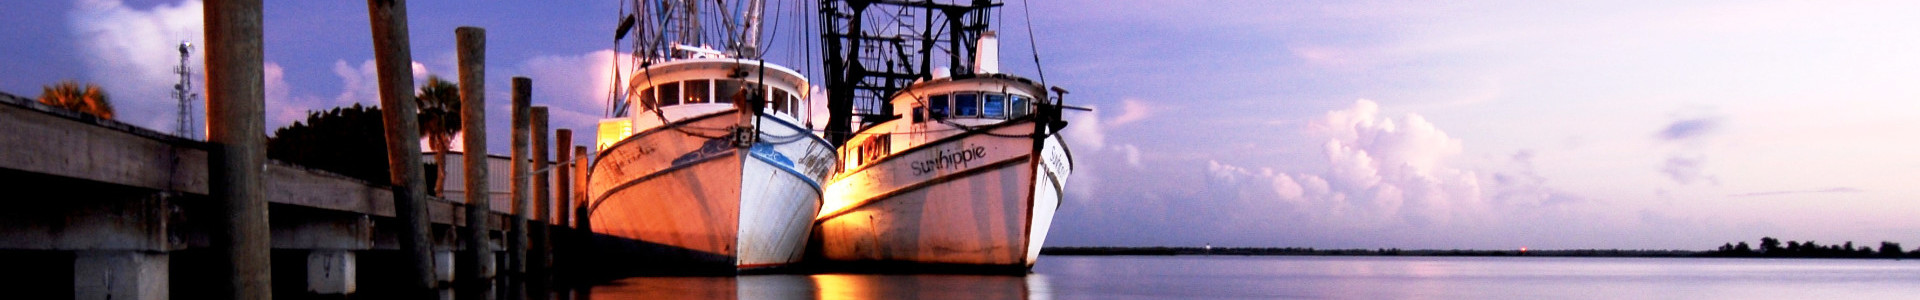 sunset boats apalach internal